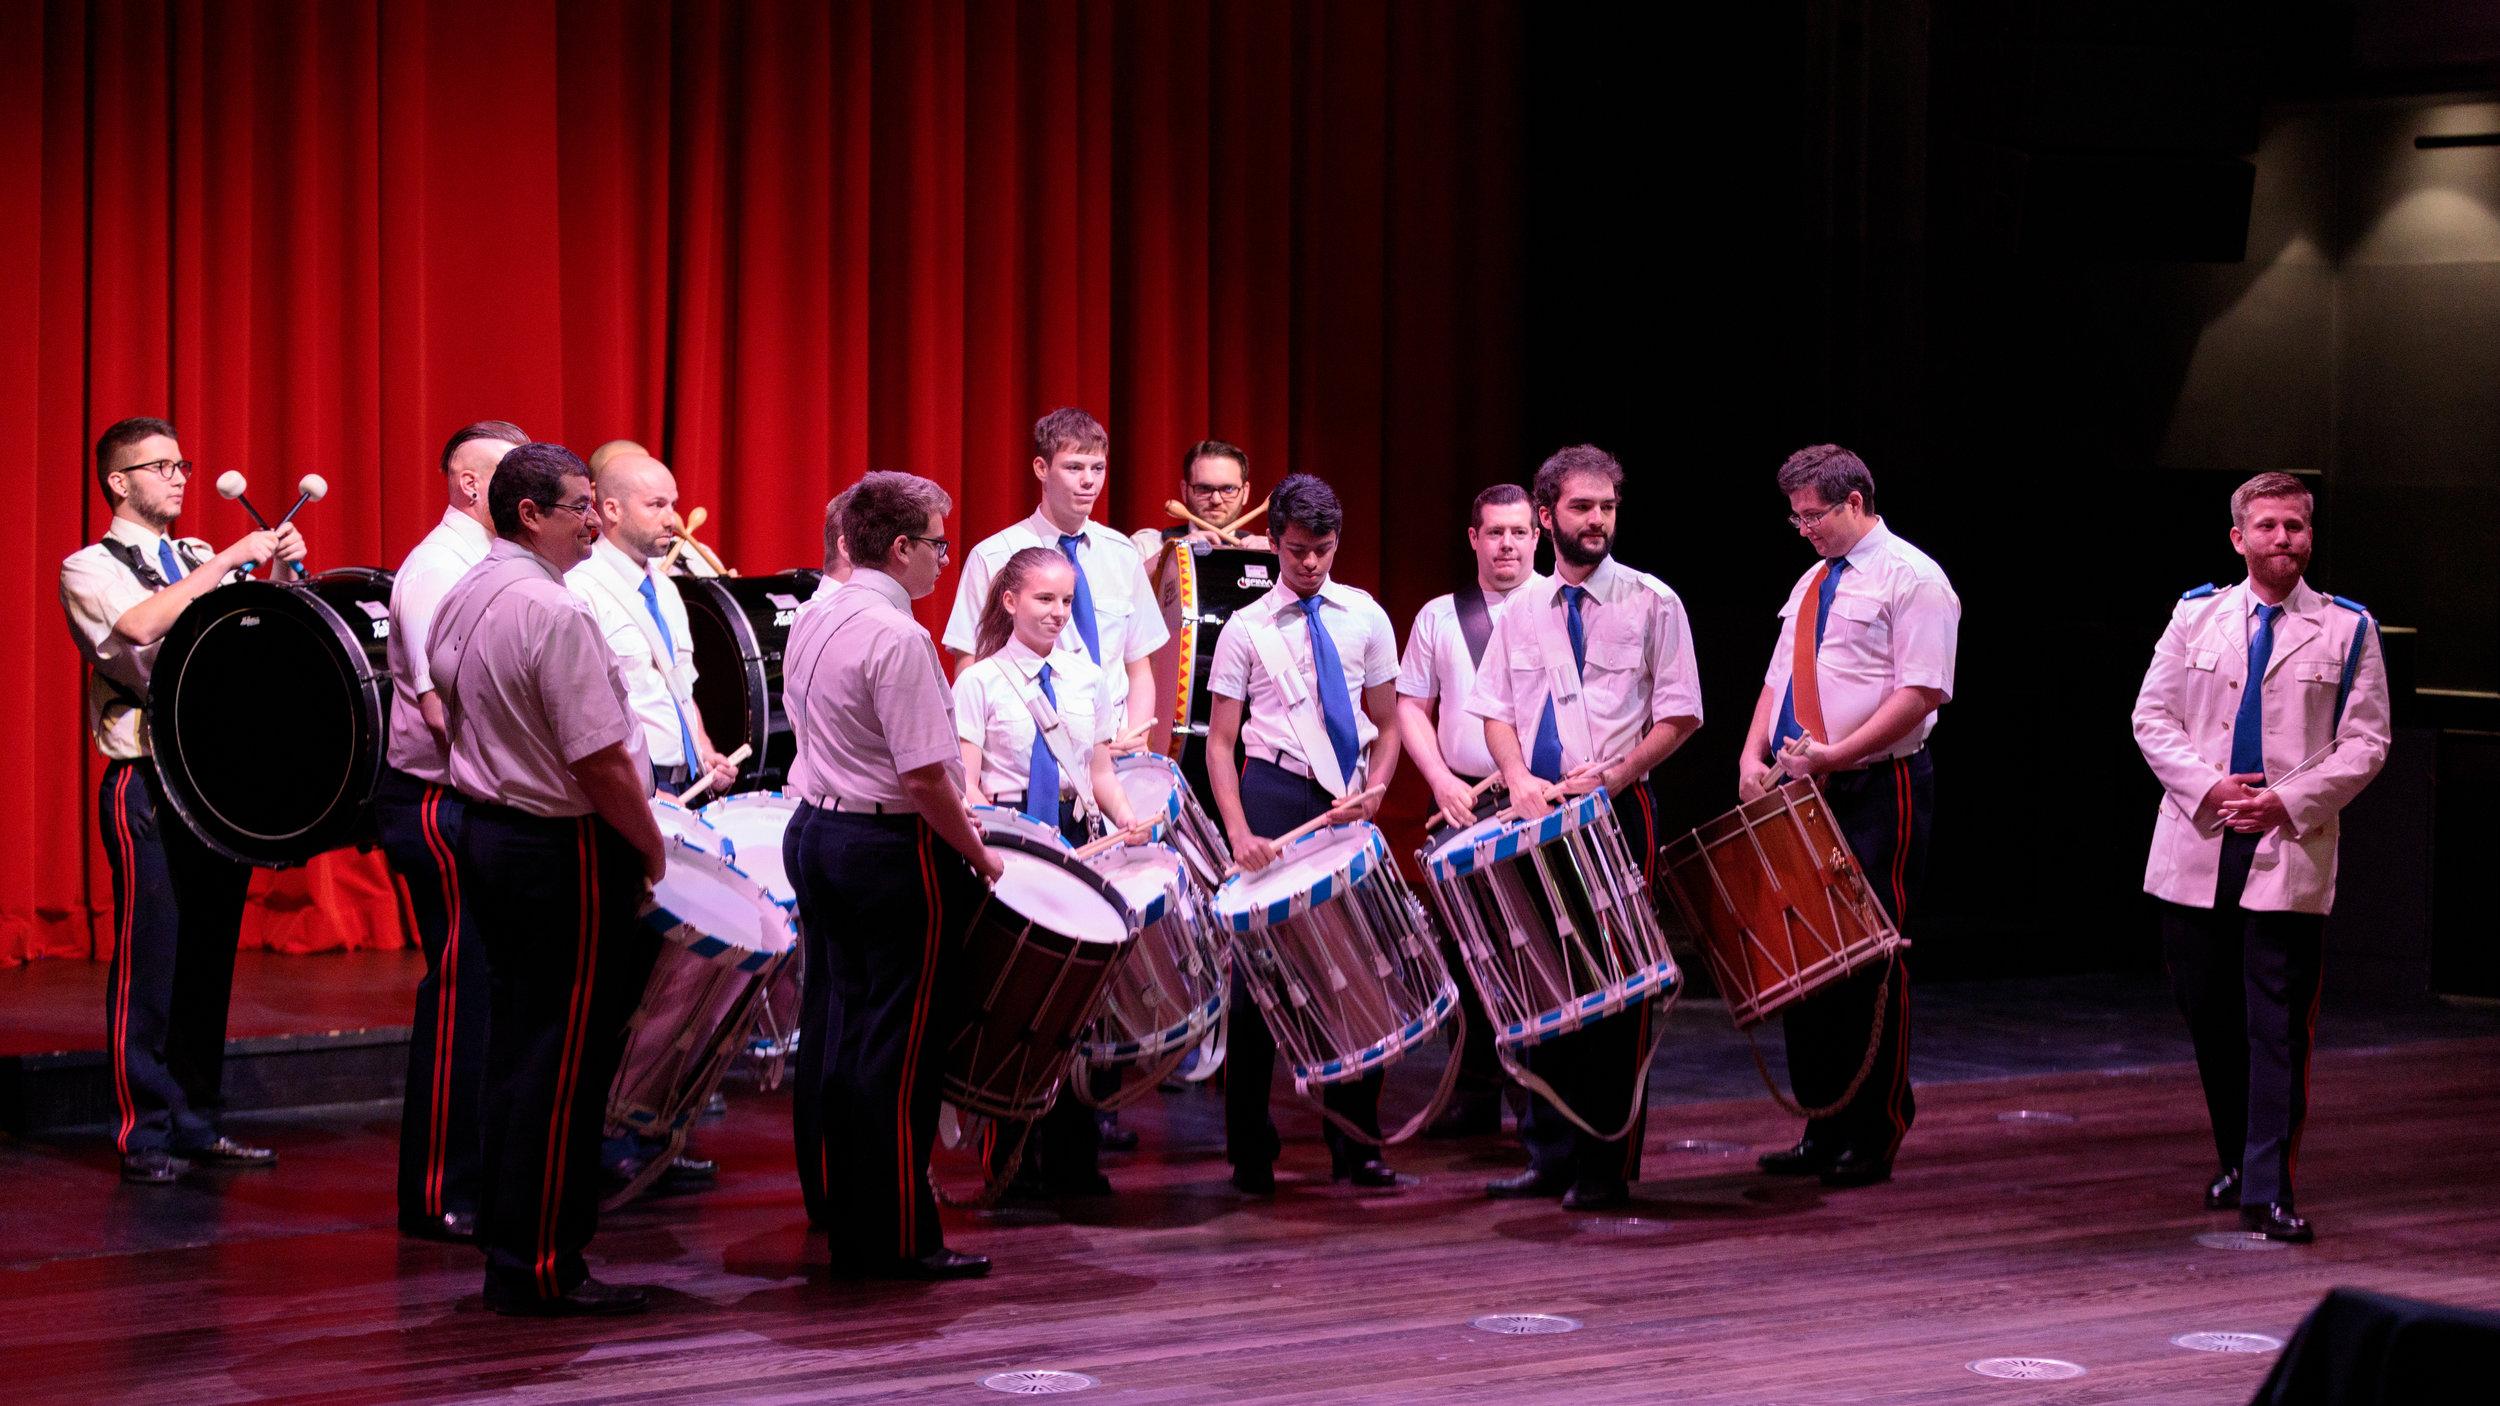 2019-05-25-concours-cantonal-tambours-acmg-1168_47931865492_o.jpg